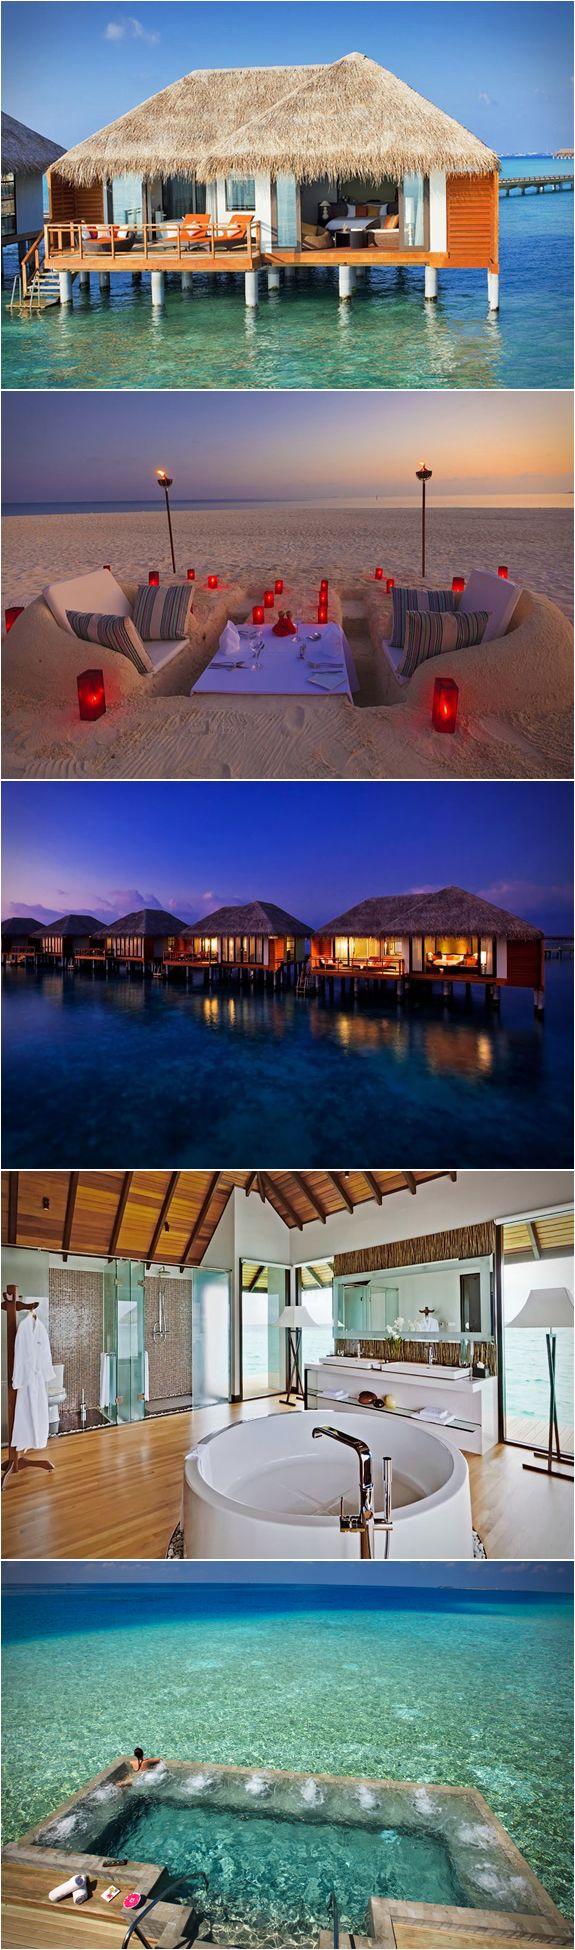 Velassaru Resort, Maldives. Future Honey Moon destination? I think hell yes.